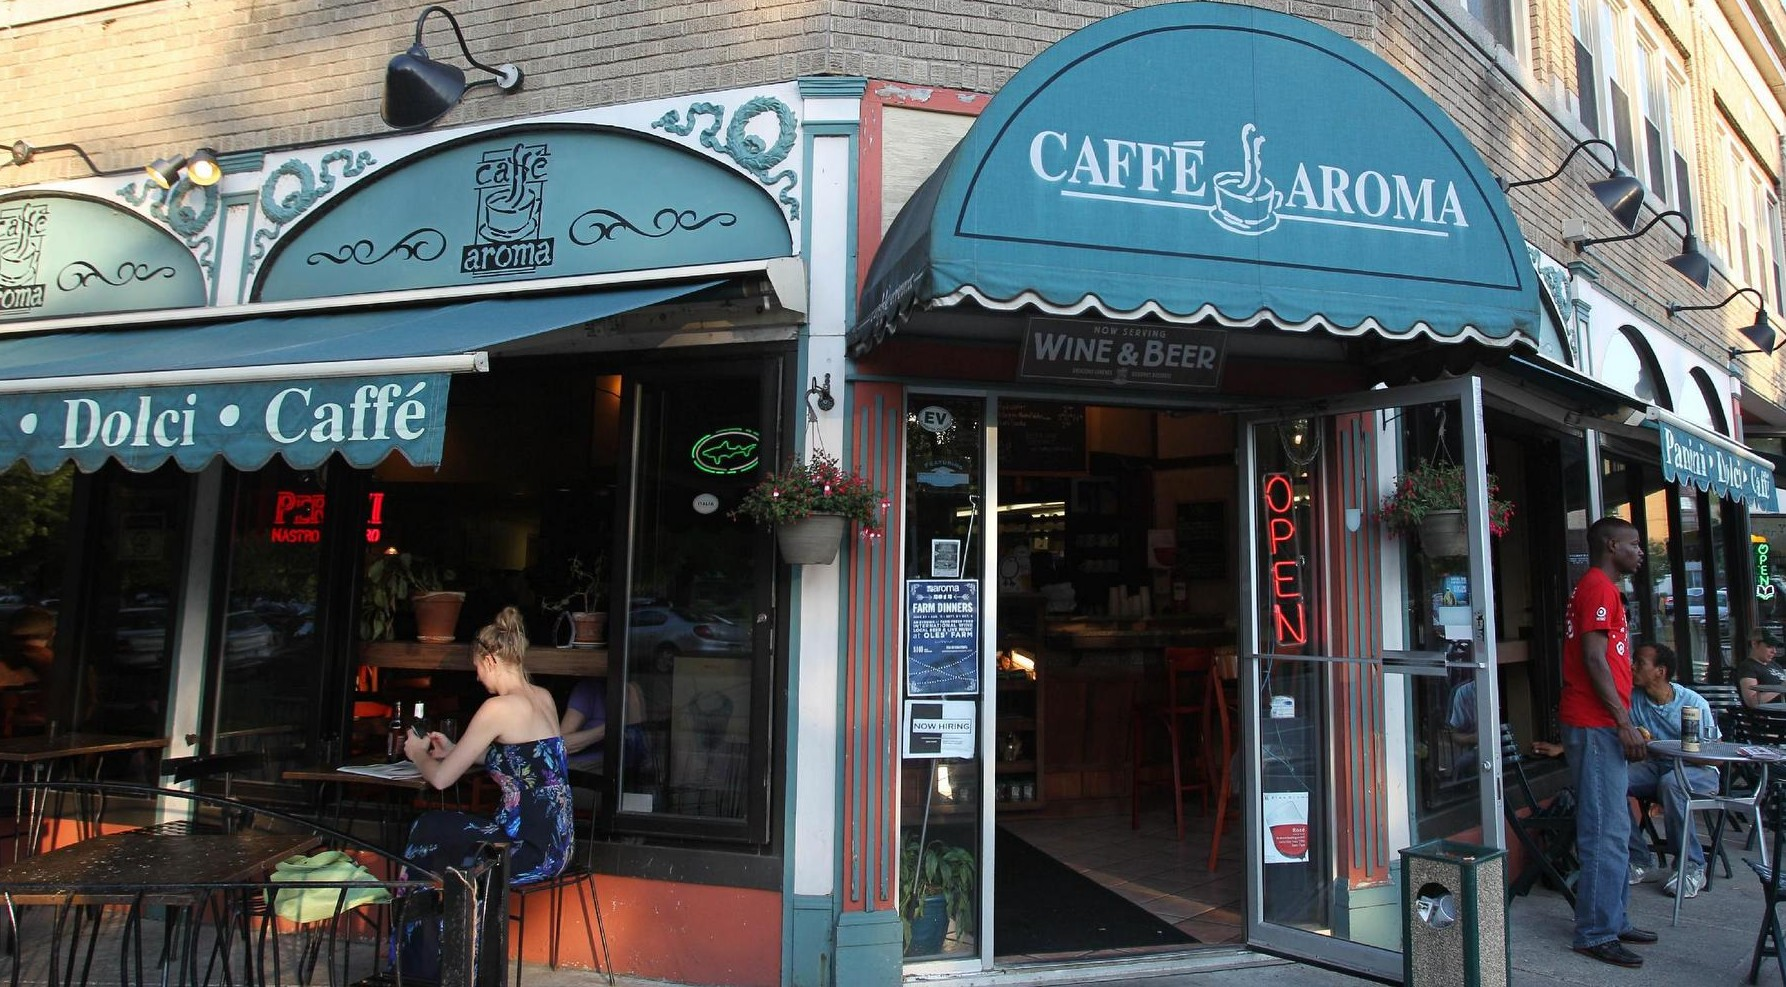 Caffe Aroma celebrates its anniversary beginning on Thursday. (Sharon Cantillon/Buffalo News file photo)